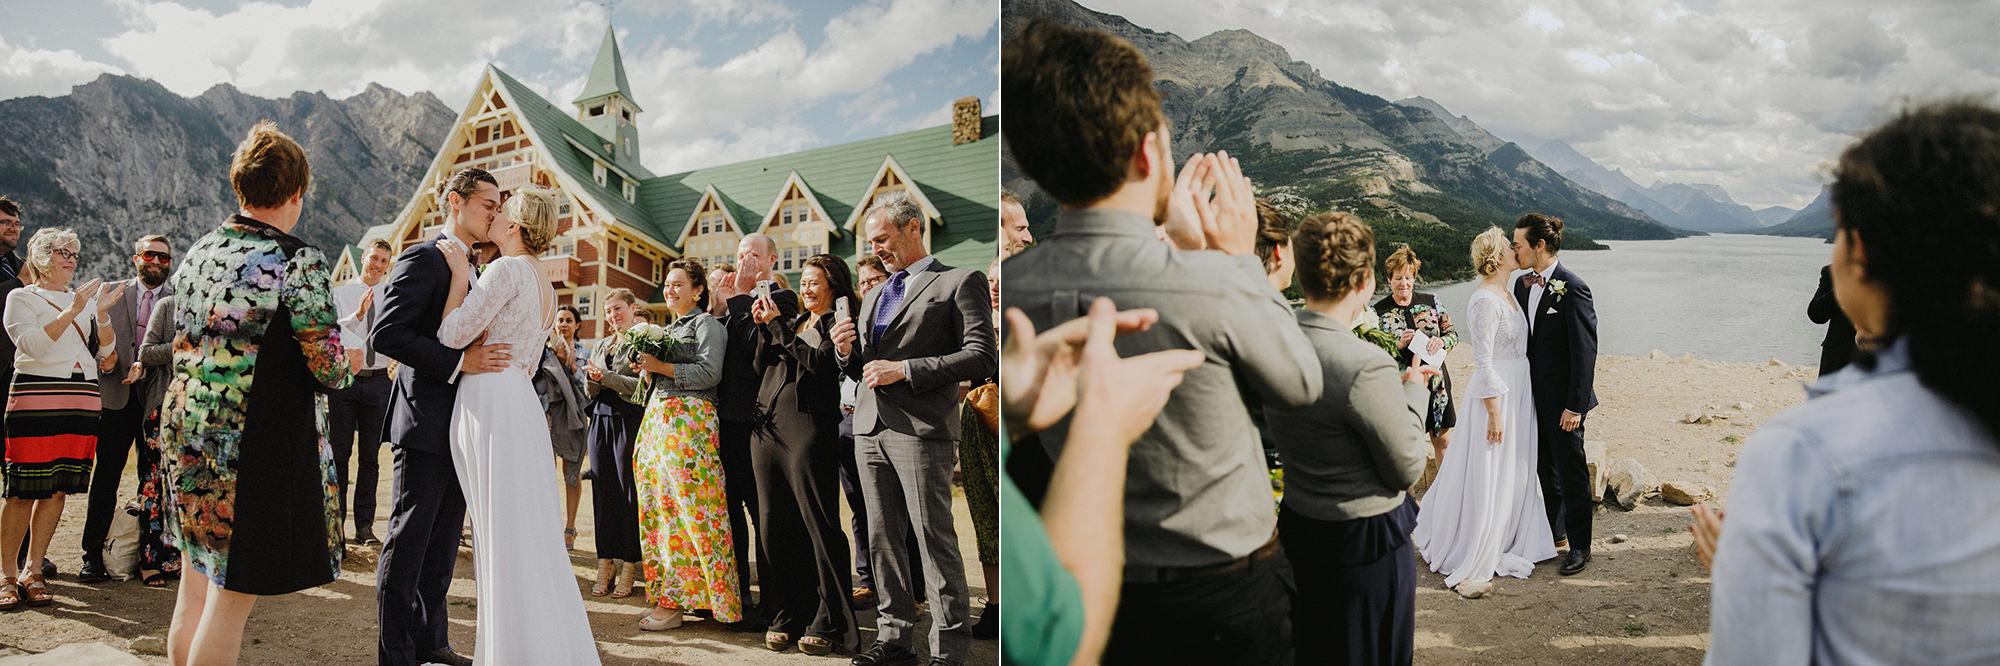 Waterton Wedding David Guenther -50.JPG